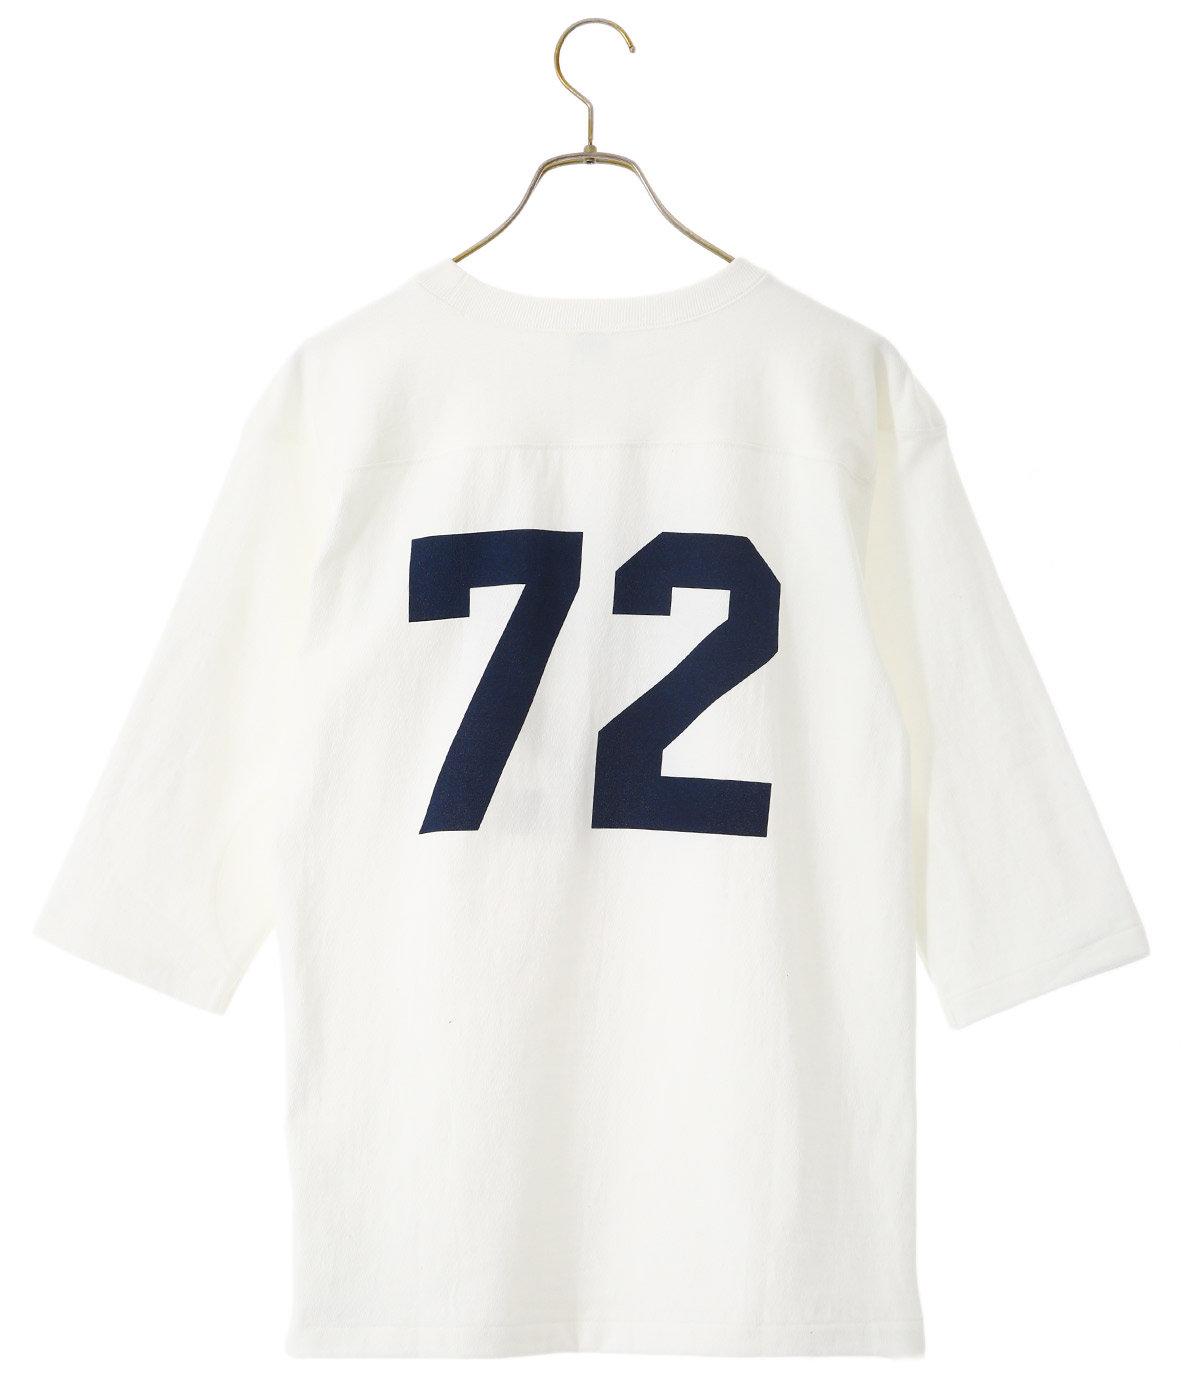 """P12"" 3/4 SLEEVE FOOTBALL T-SHIRT"